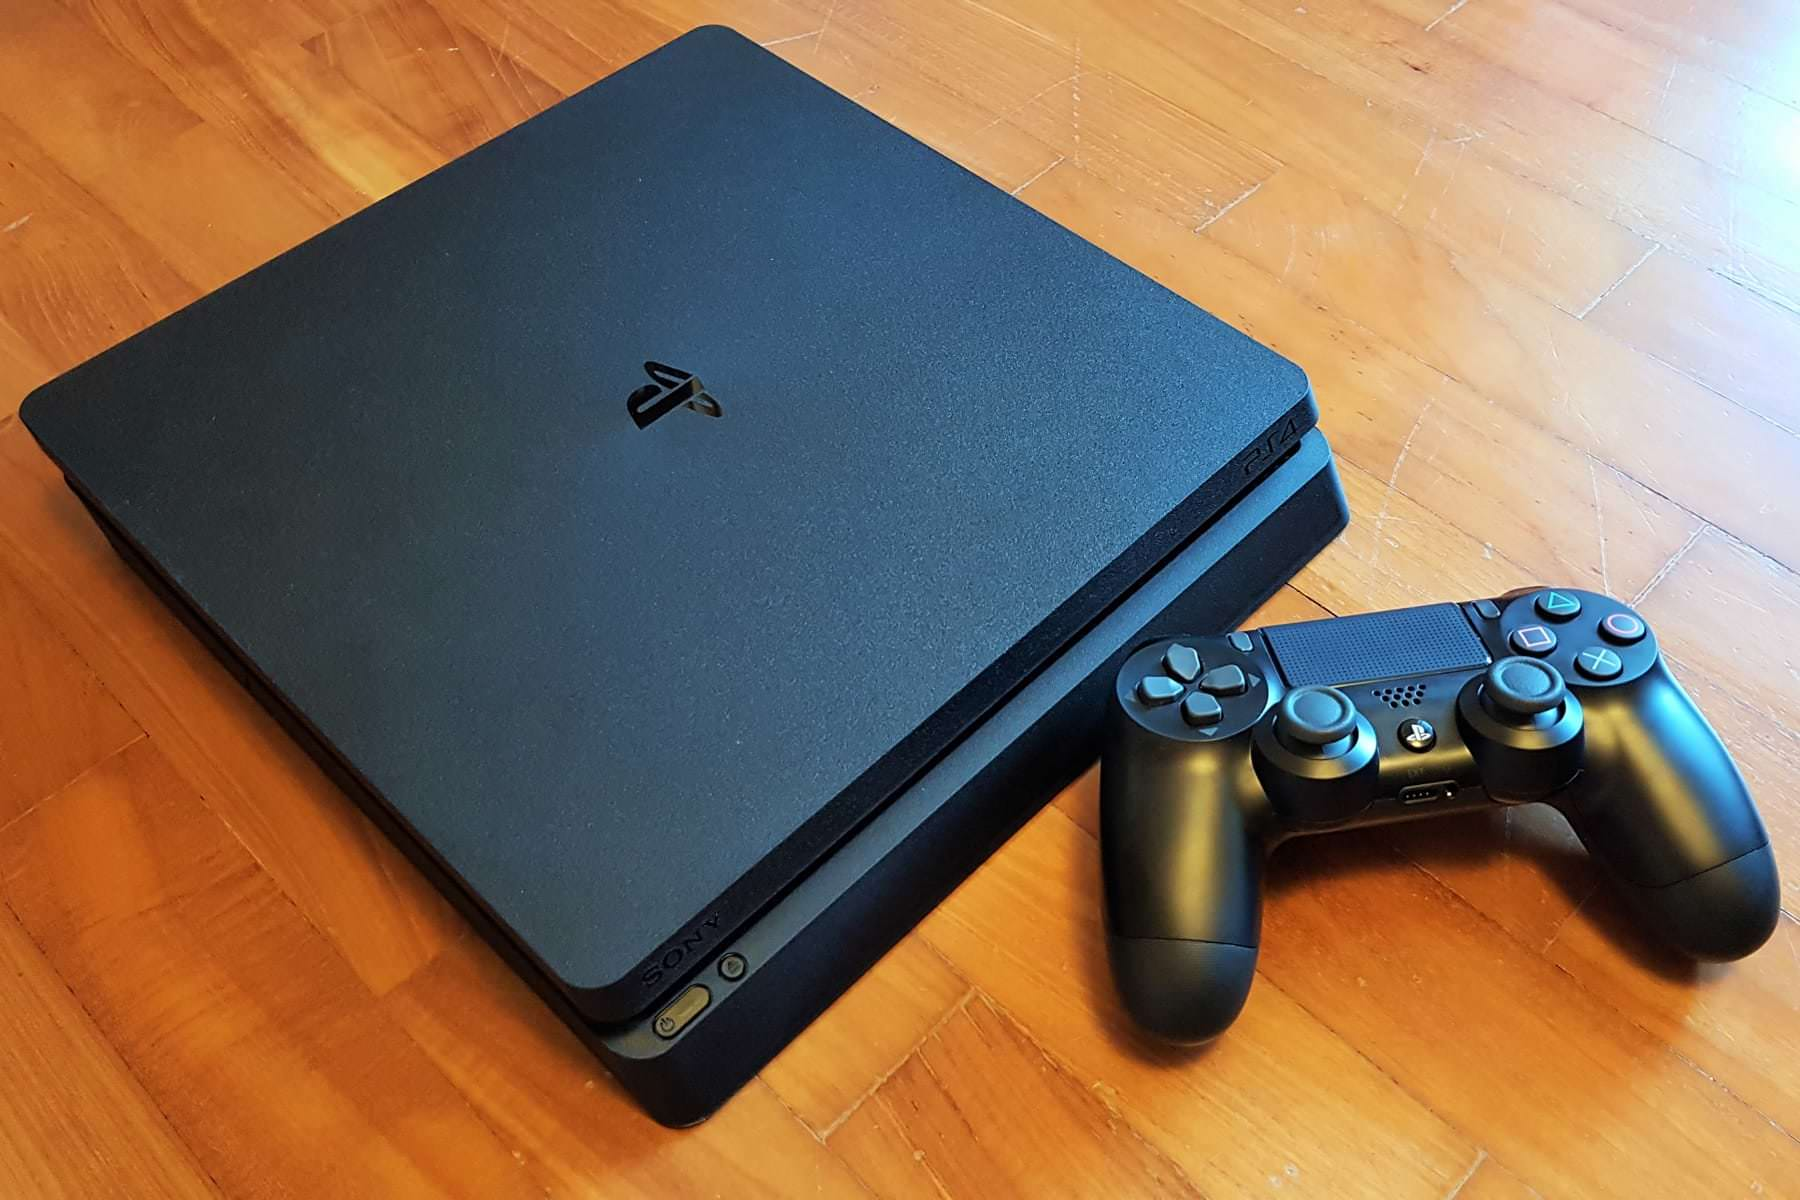 Sony-PlayStation-4-Slim-PS4-67